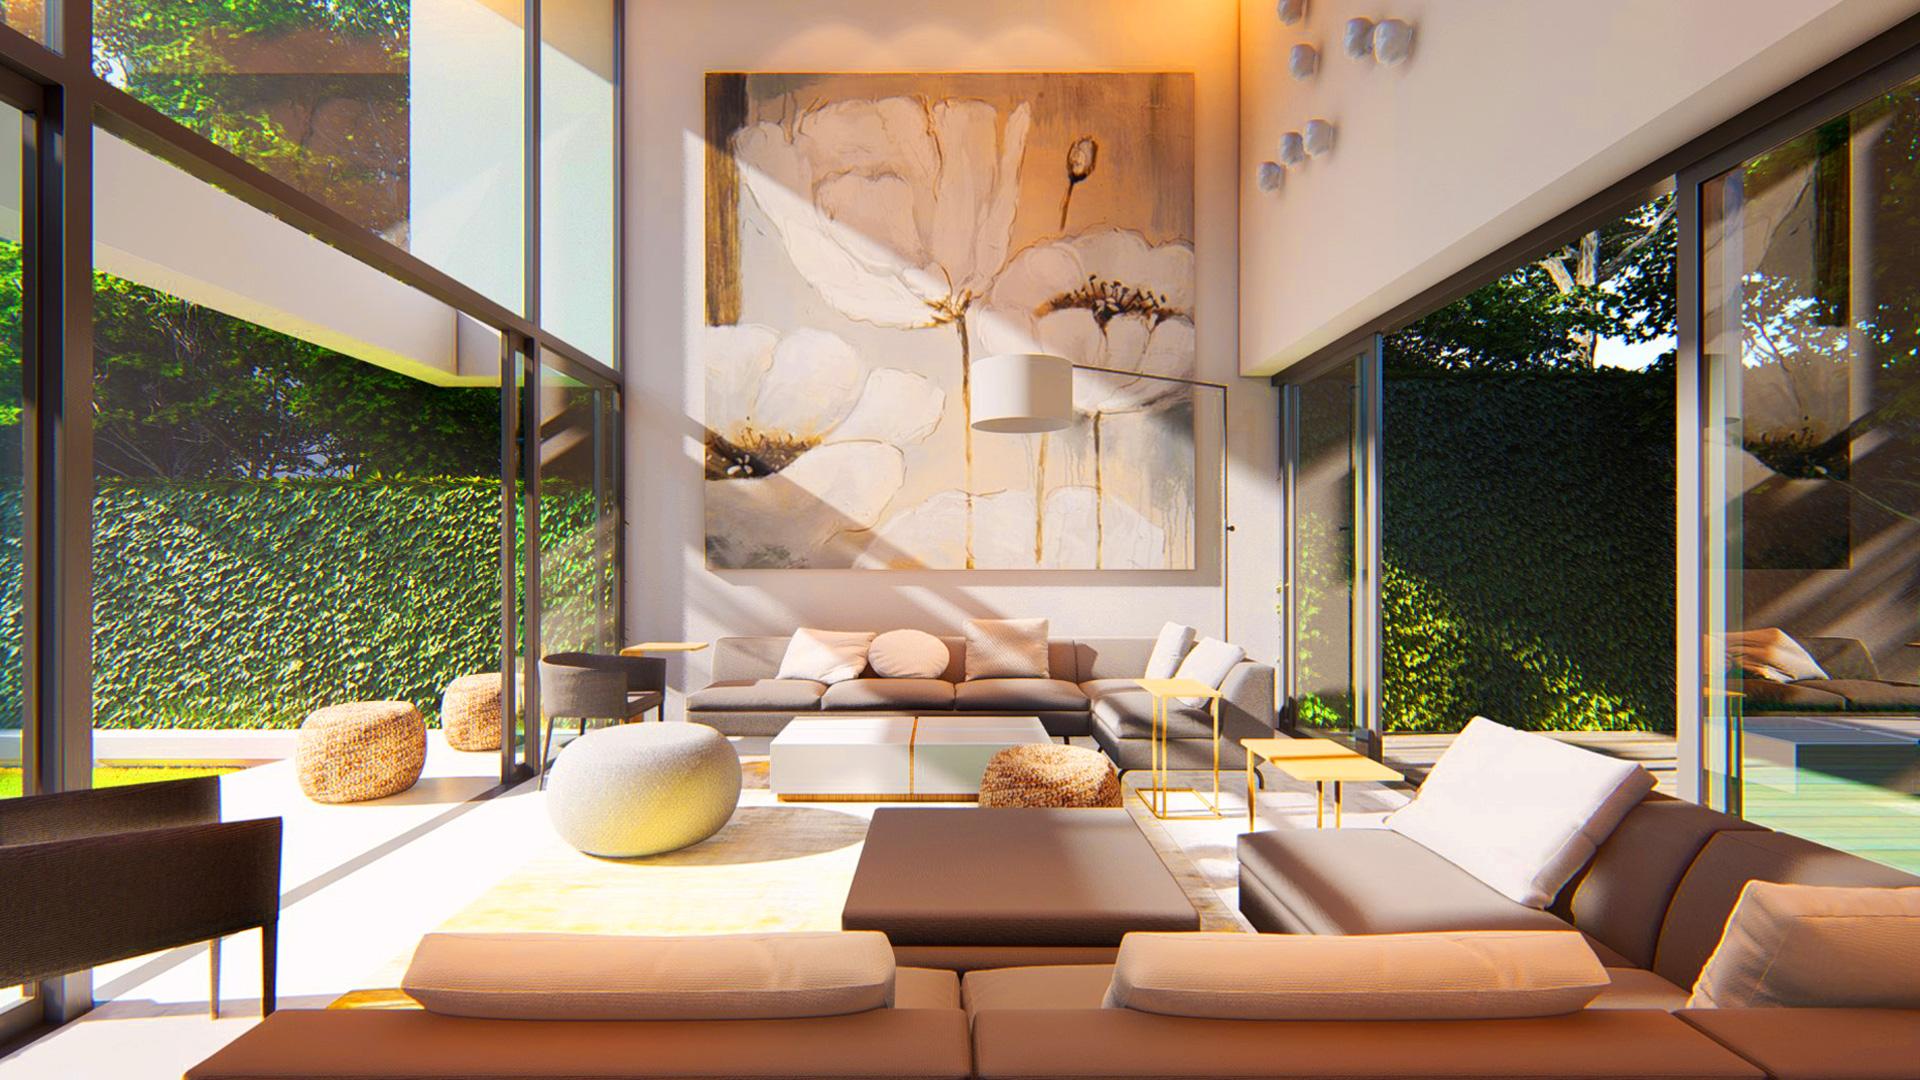 MAP_Design_House_Architecture_Modern_Architect_Kiran_Mathema_Veranda_Living_Double_Height